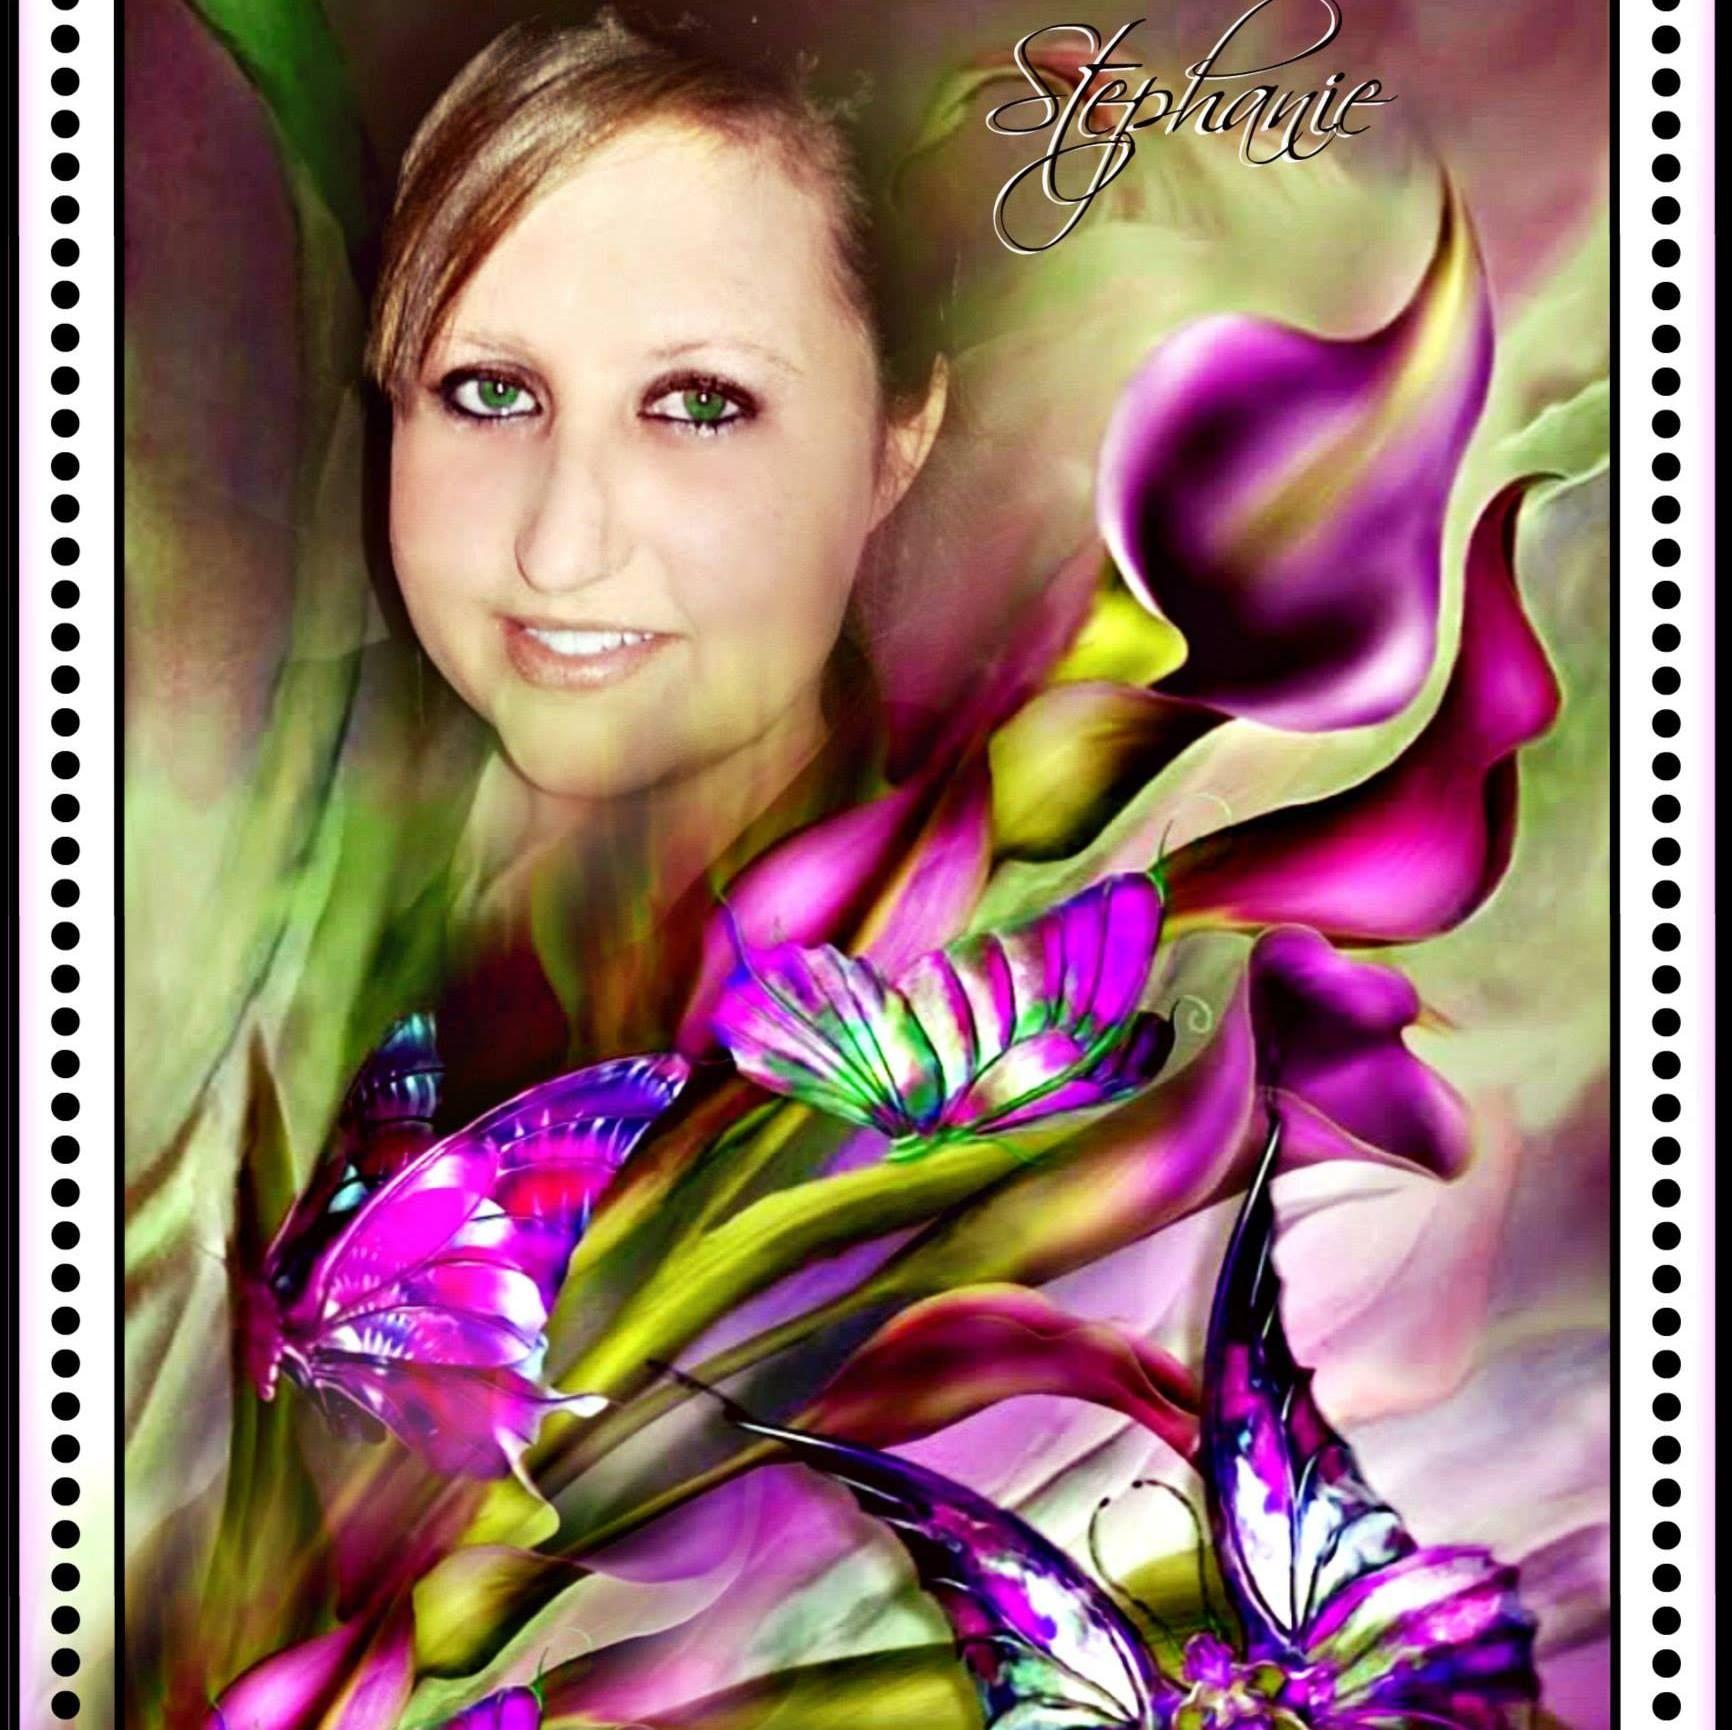 Stephanie Dawn Clark, #butterfly  https://www.facebook.com/photo.php?fbid=690882917620641&set=a.143952128980392.18570.100000968174061&type=1&theater